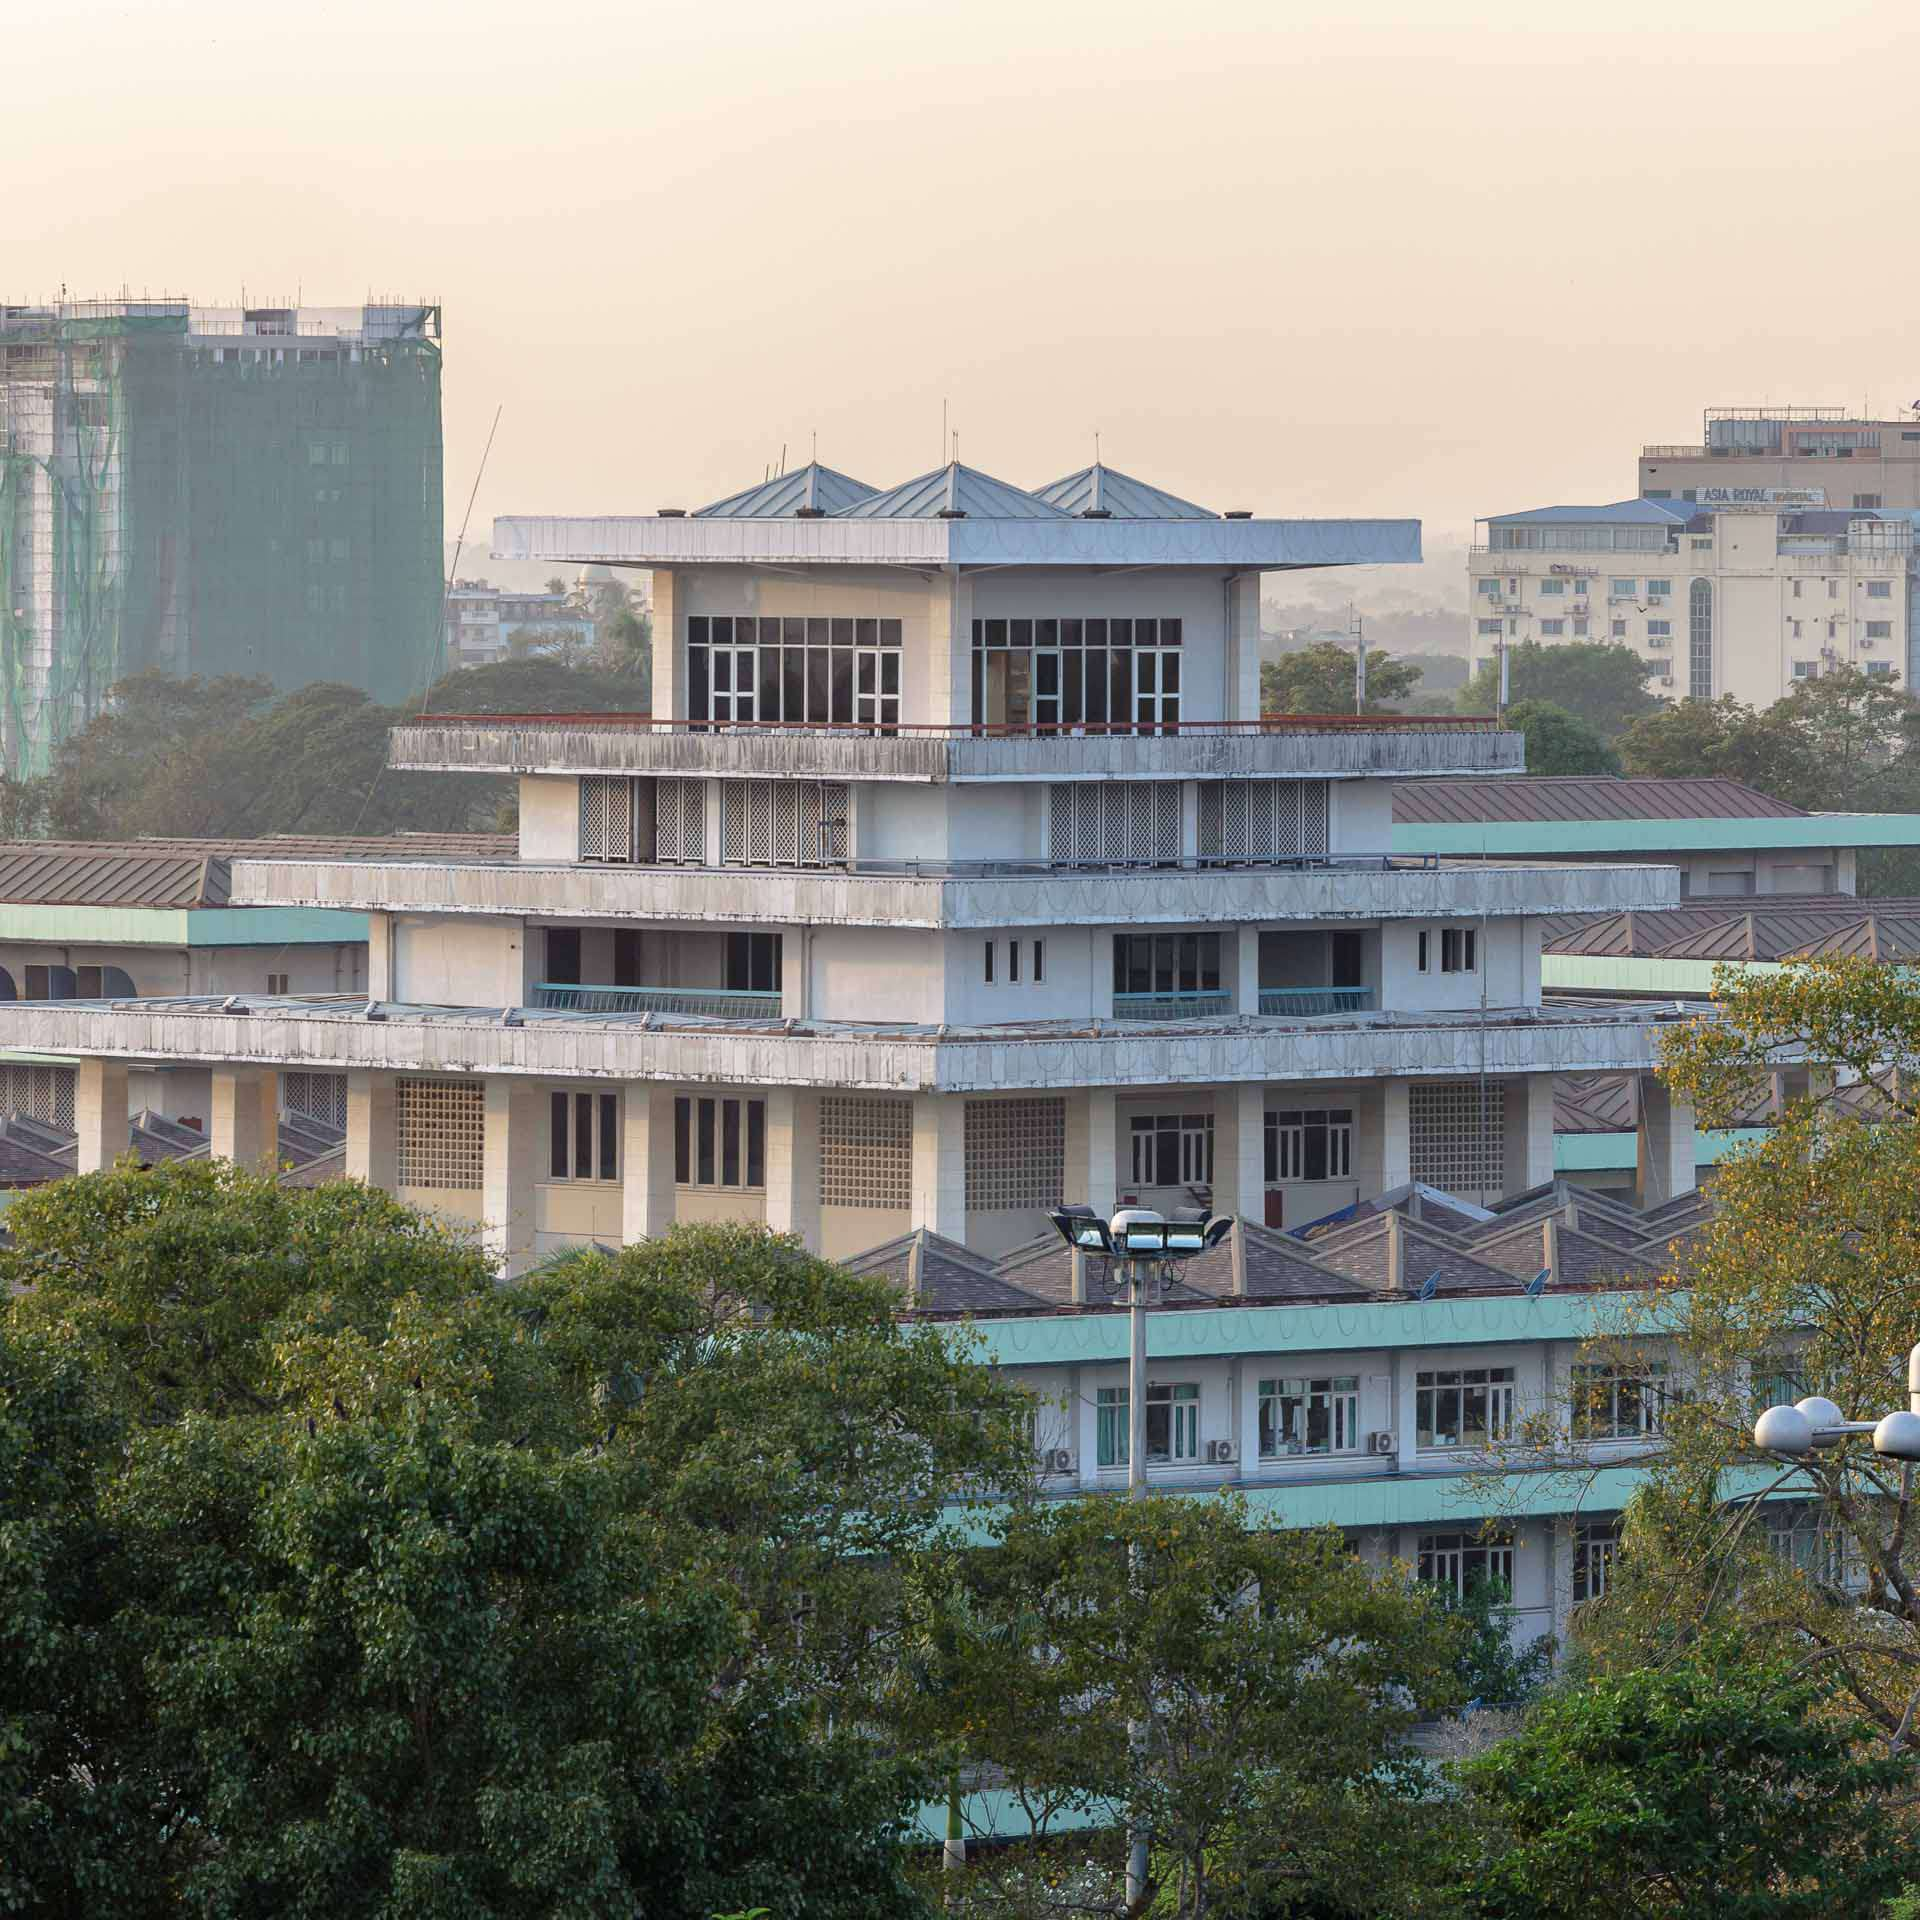 Dagon and Mingala Taungnyunt Townships – Architectural Guide: Yangon